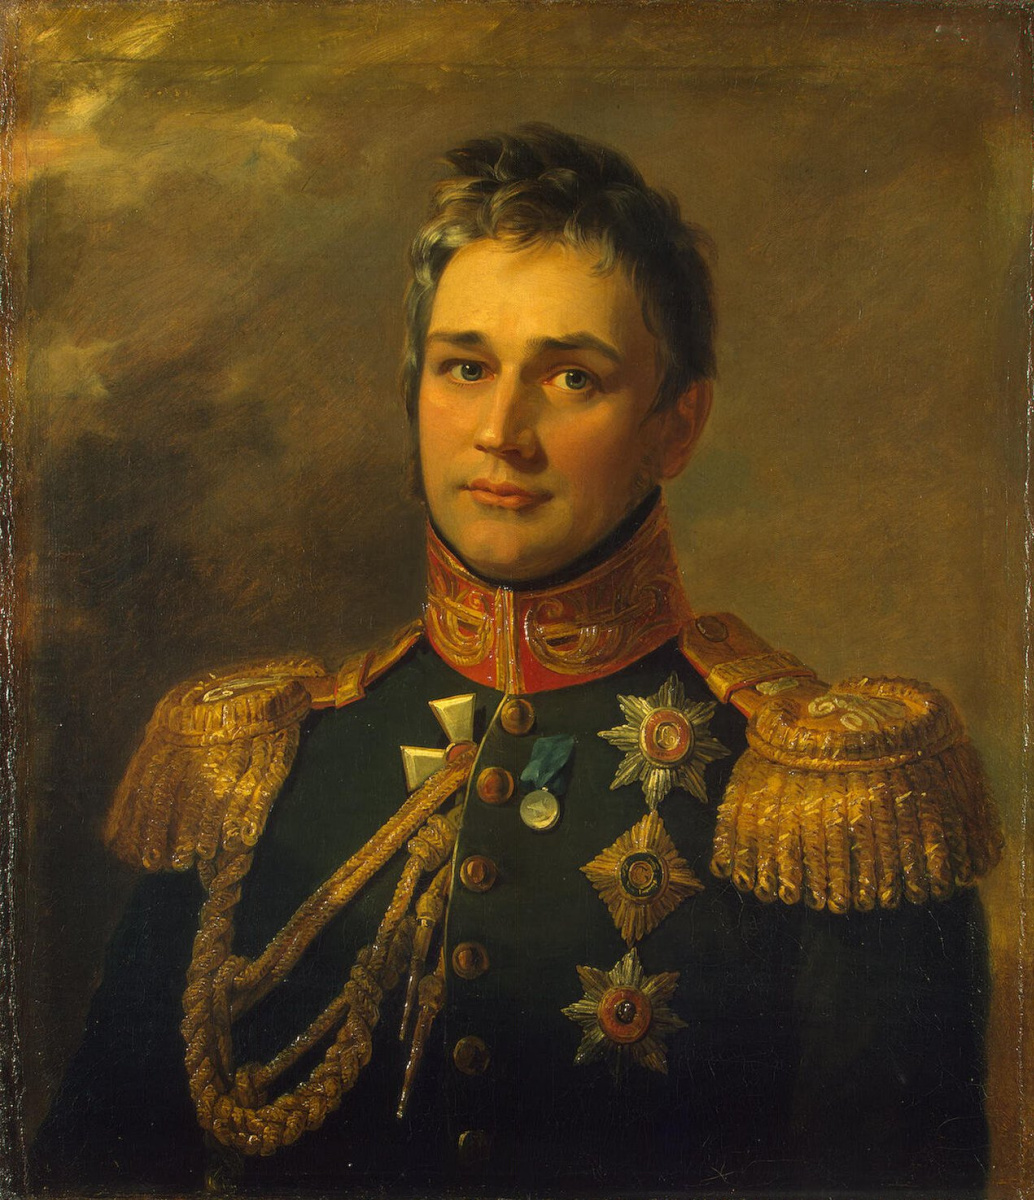 Джордж Доу. Портрет Михаила Семеновича Воронцова